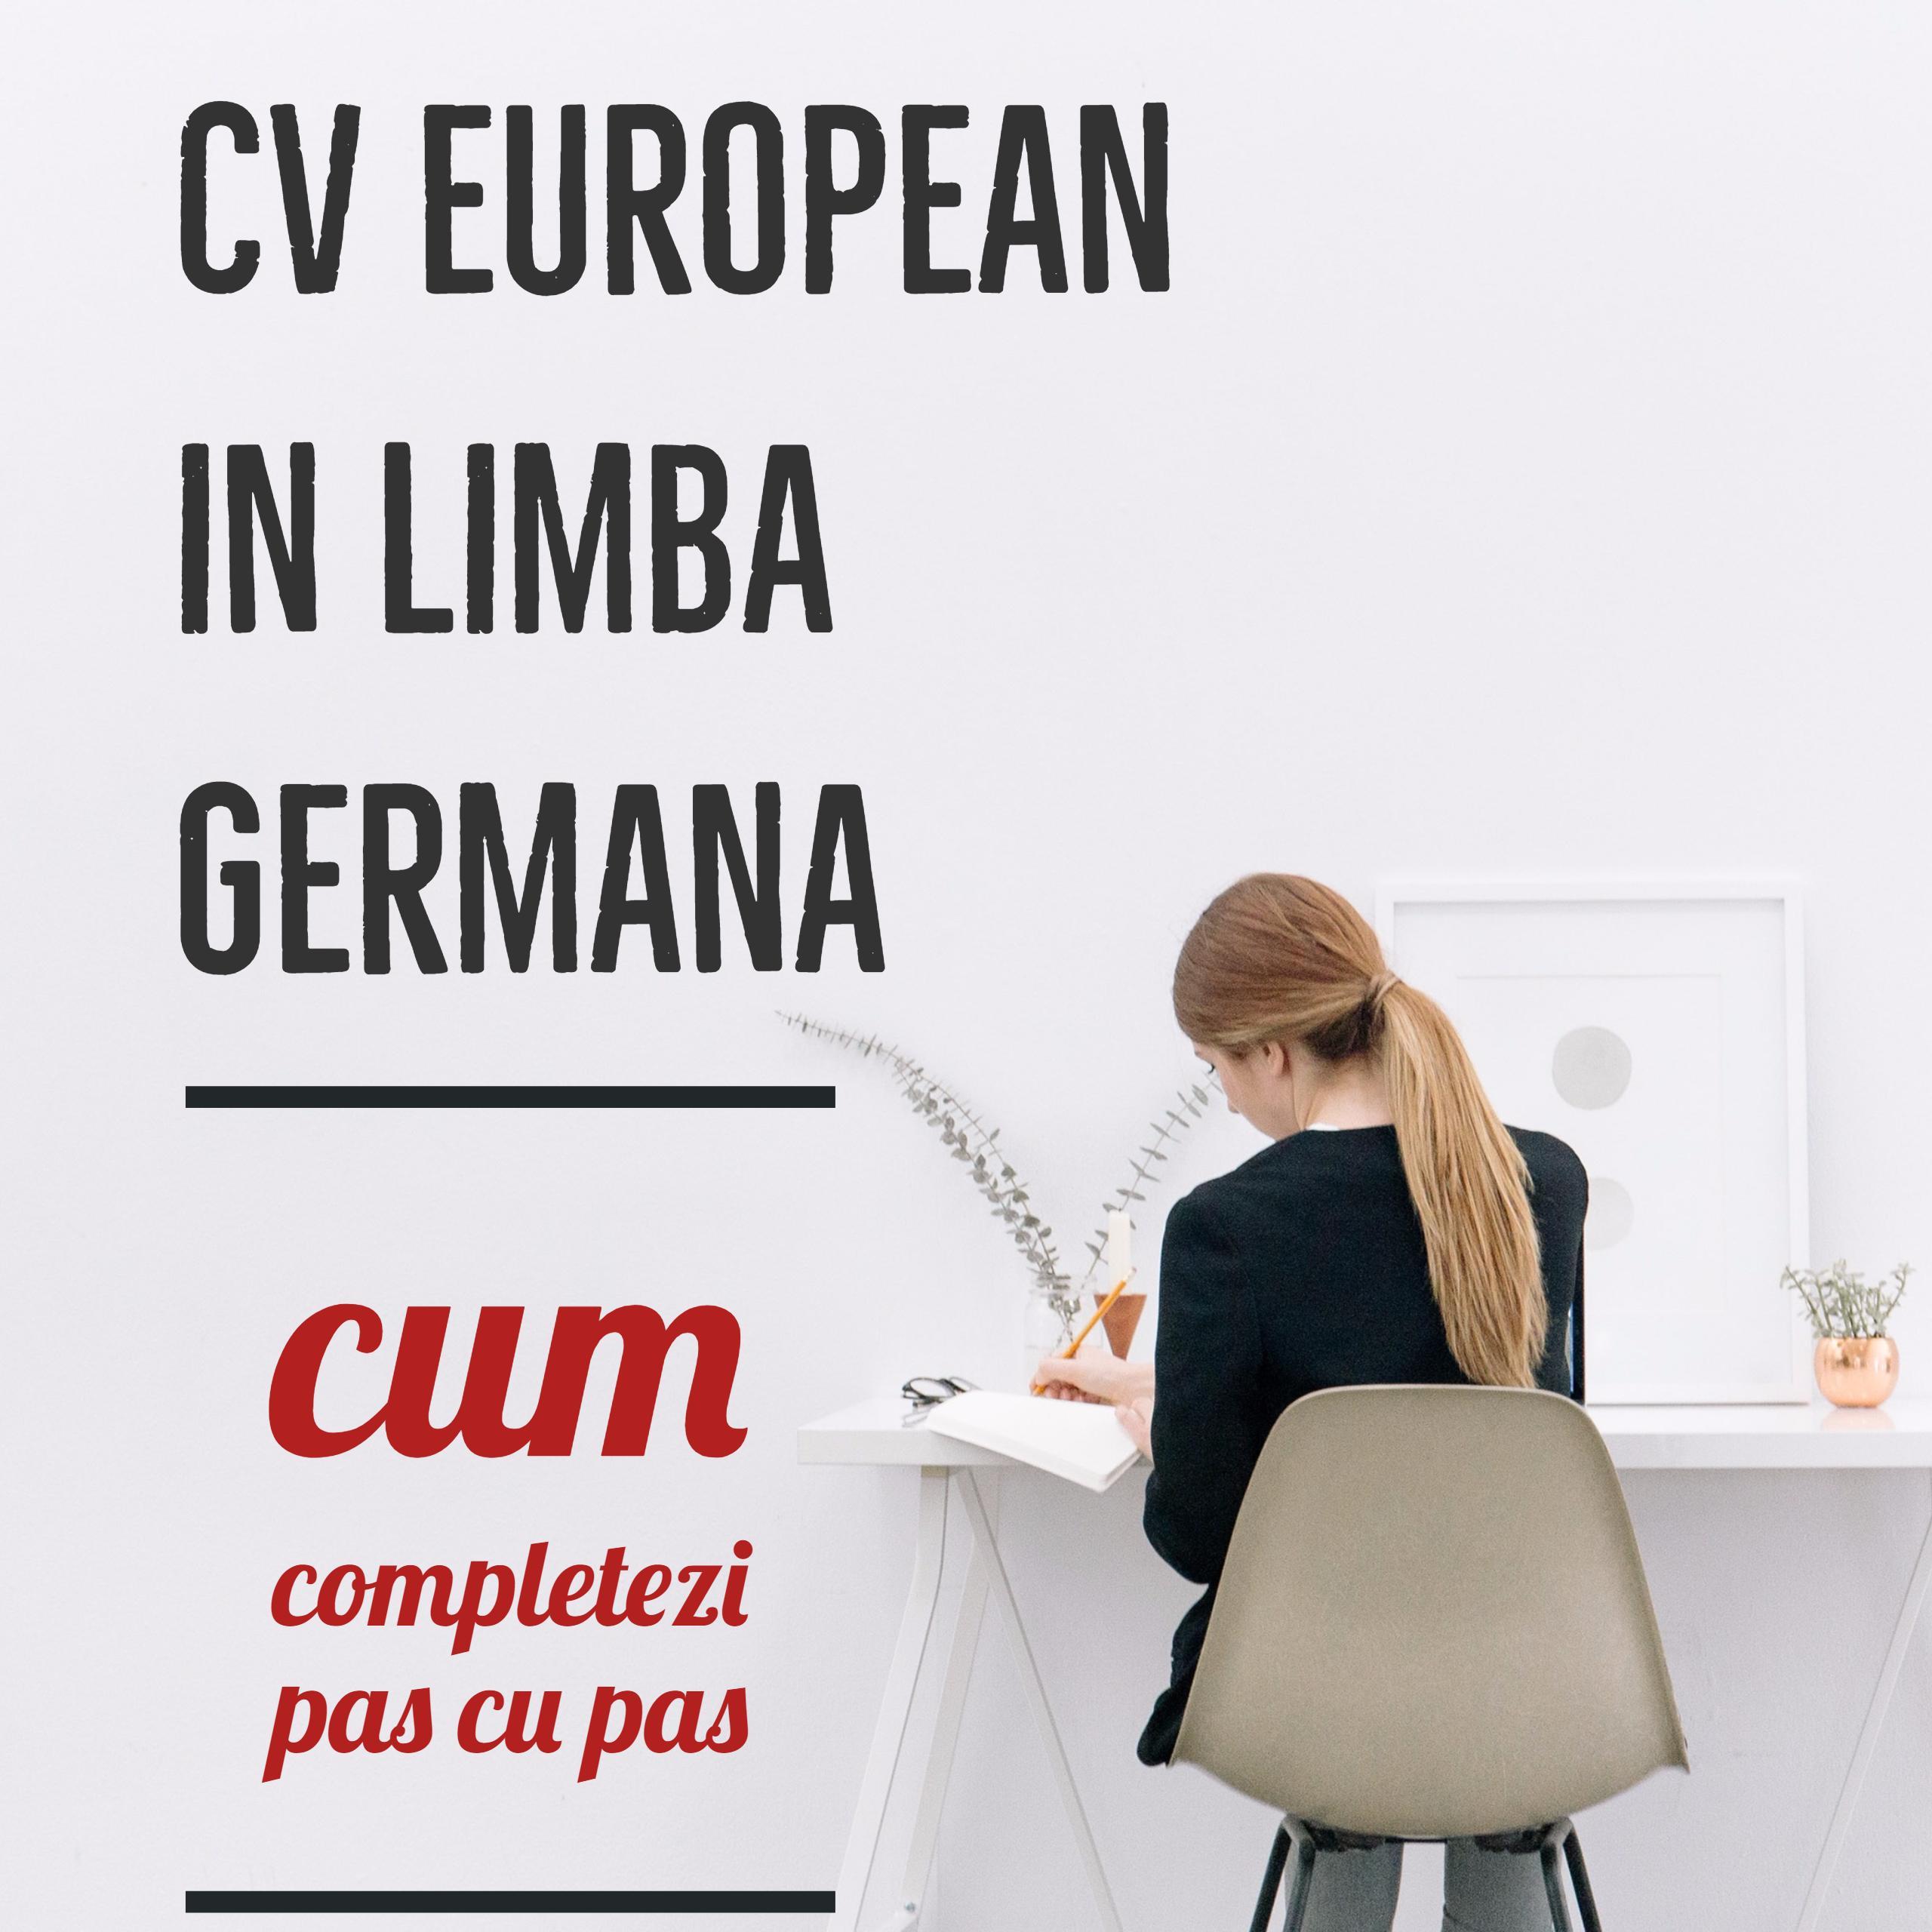 Cv european in germana ghid de completare pas cu pas gutejobs cv european in germana ghid de completare pas cu pas yelopaper Choice Image